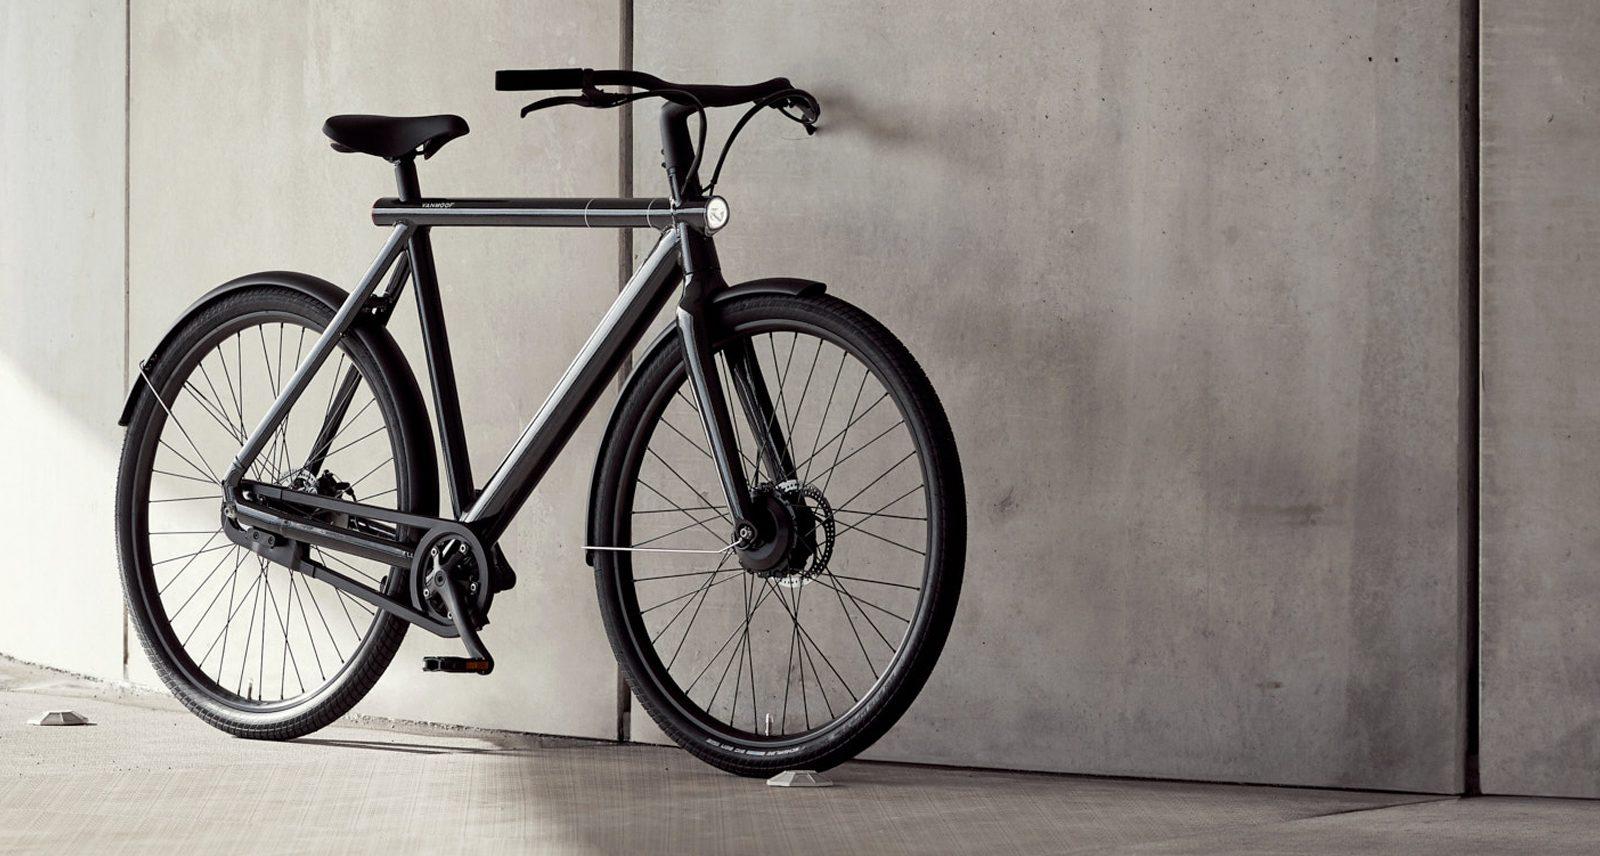 VanMoof's S2 Is the Undisputed Tesla of E-Bikes